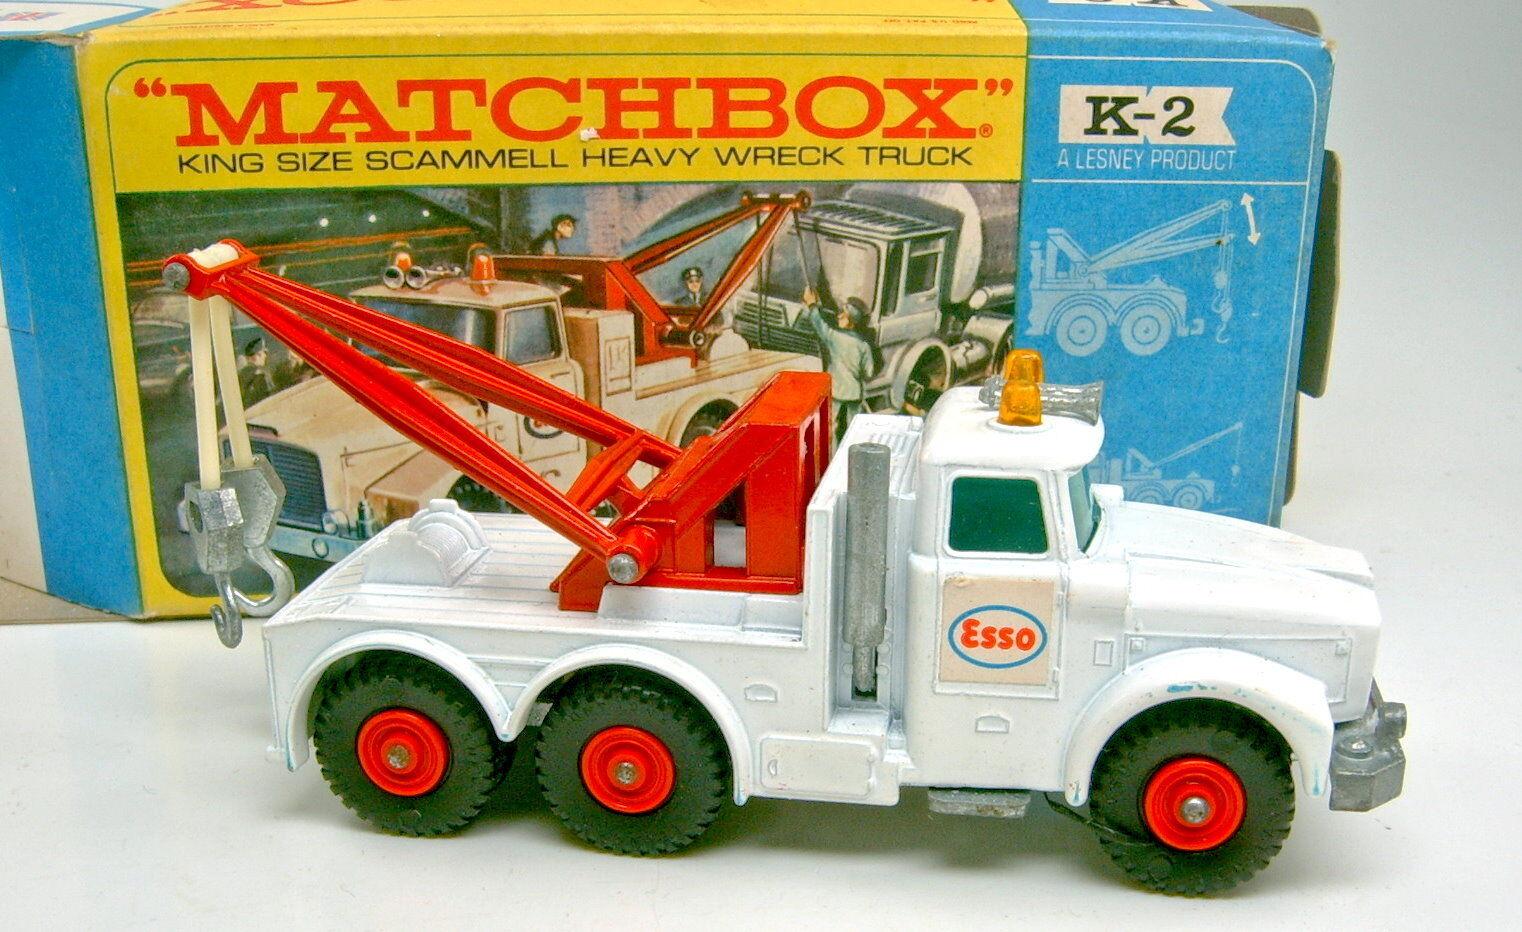 Matchbox KingSize KingSize KingSize k-2c SCAMMEL WRECK TRUCK blanc verte vitres Top Dans Box | élégant  251b2e